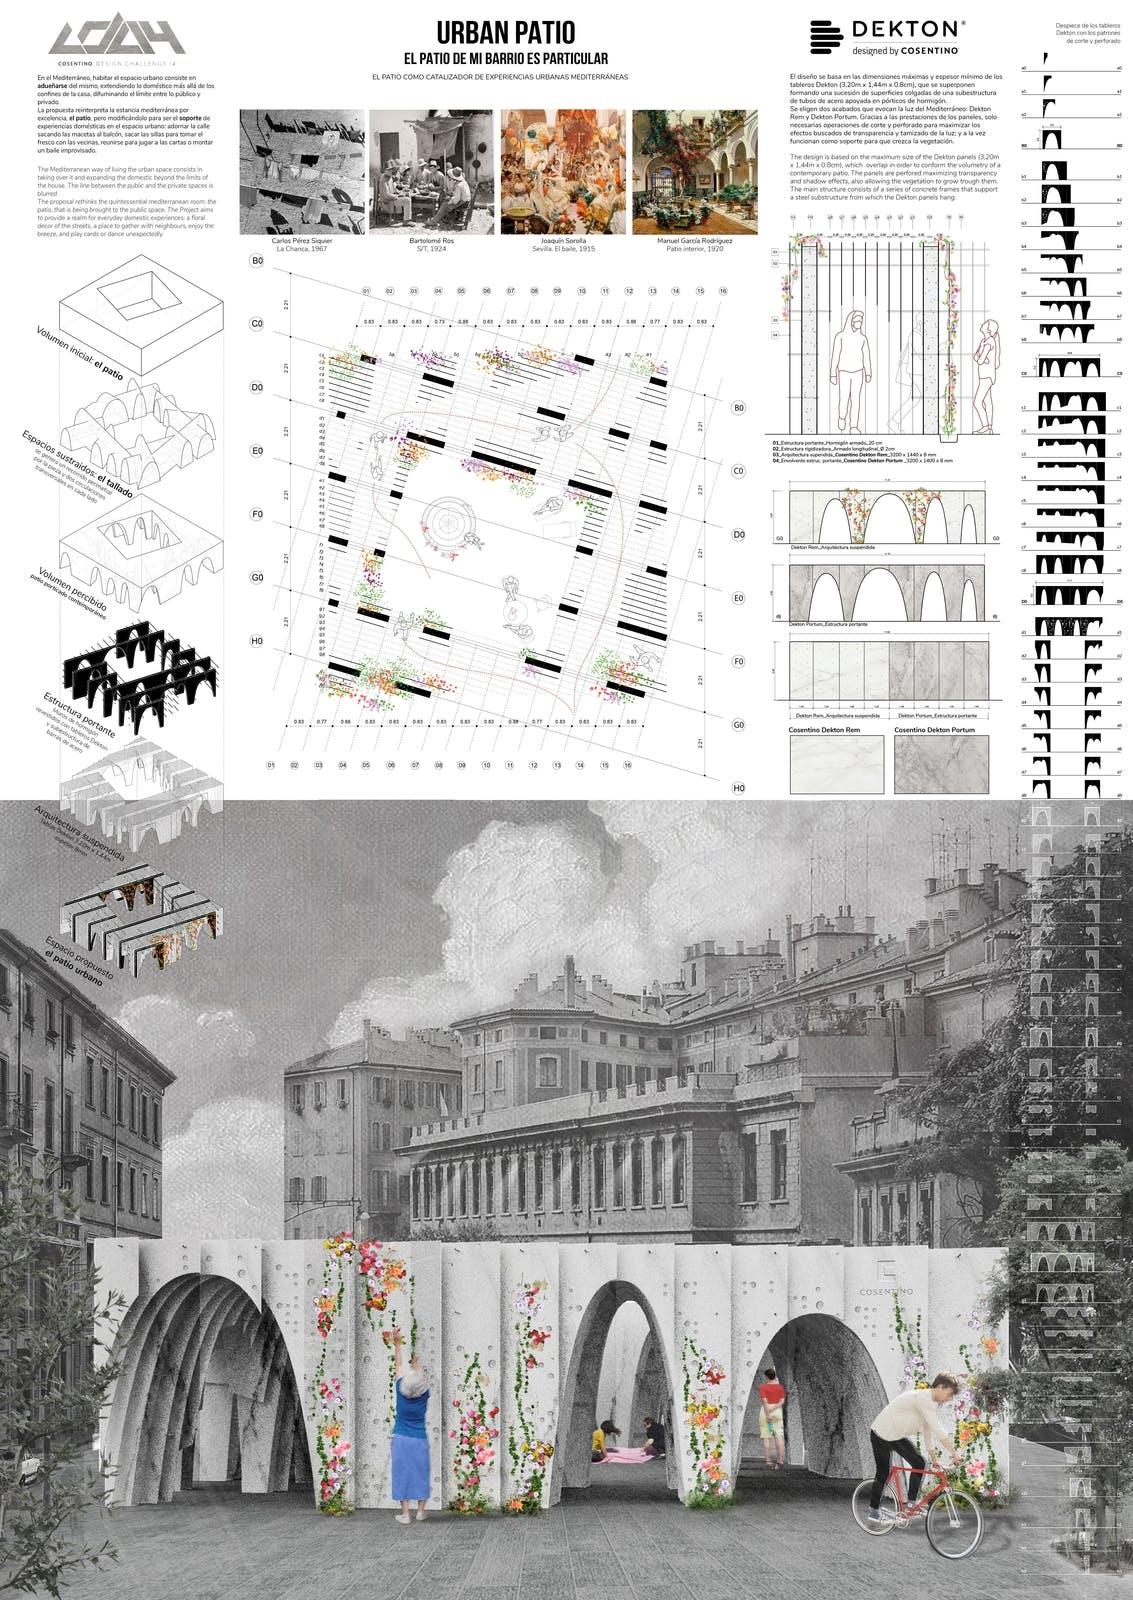 Image of 067 URBAN PATIO s in Cosentino Design Challenge 14 winners - Cosentino